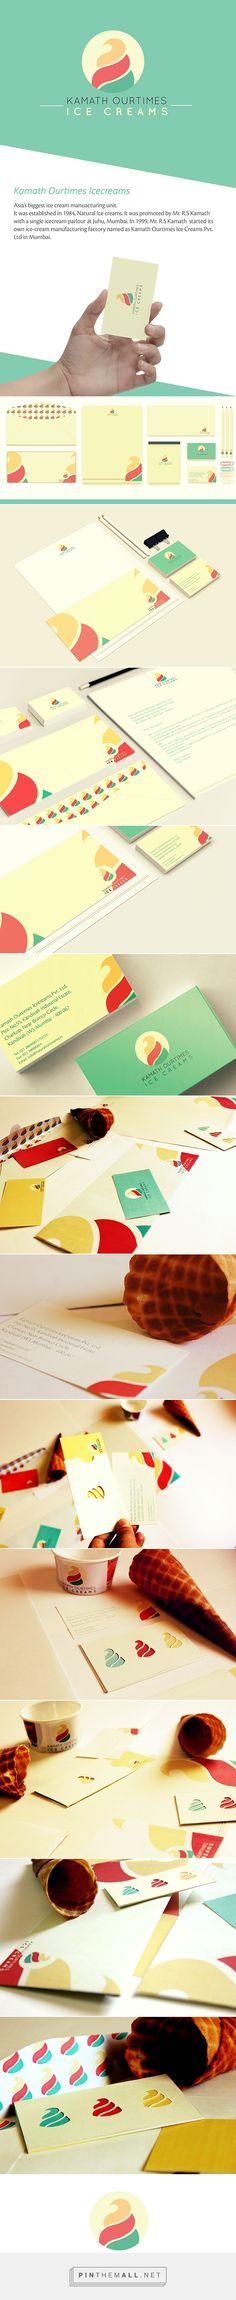 Kamath Ourtimes Ice Cream Branding by Meroo Seth | Fivestar Branding – Design and Branding Agency & Inspiration Gallery